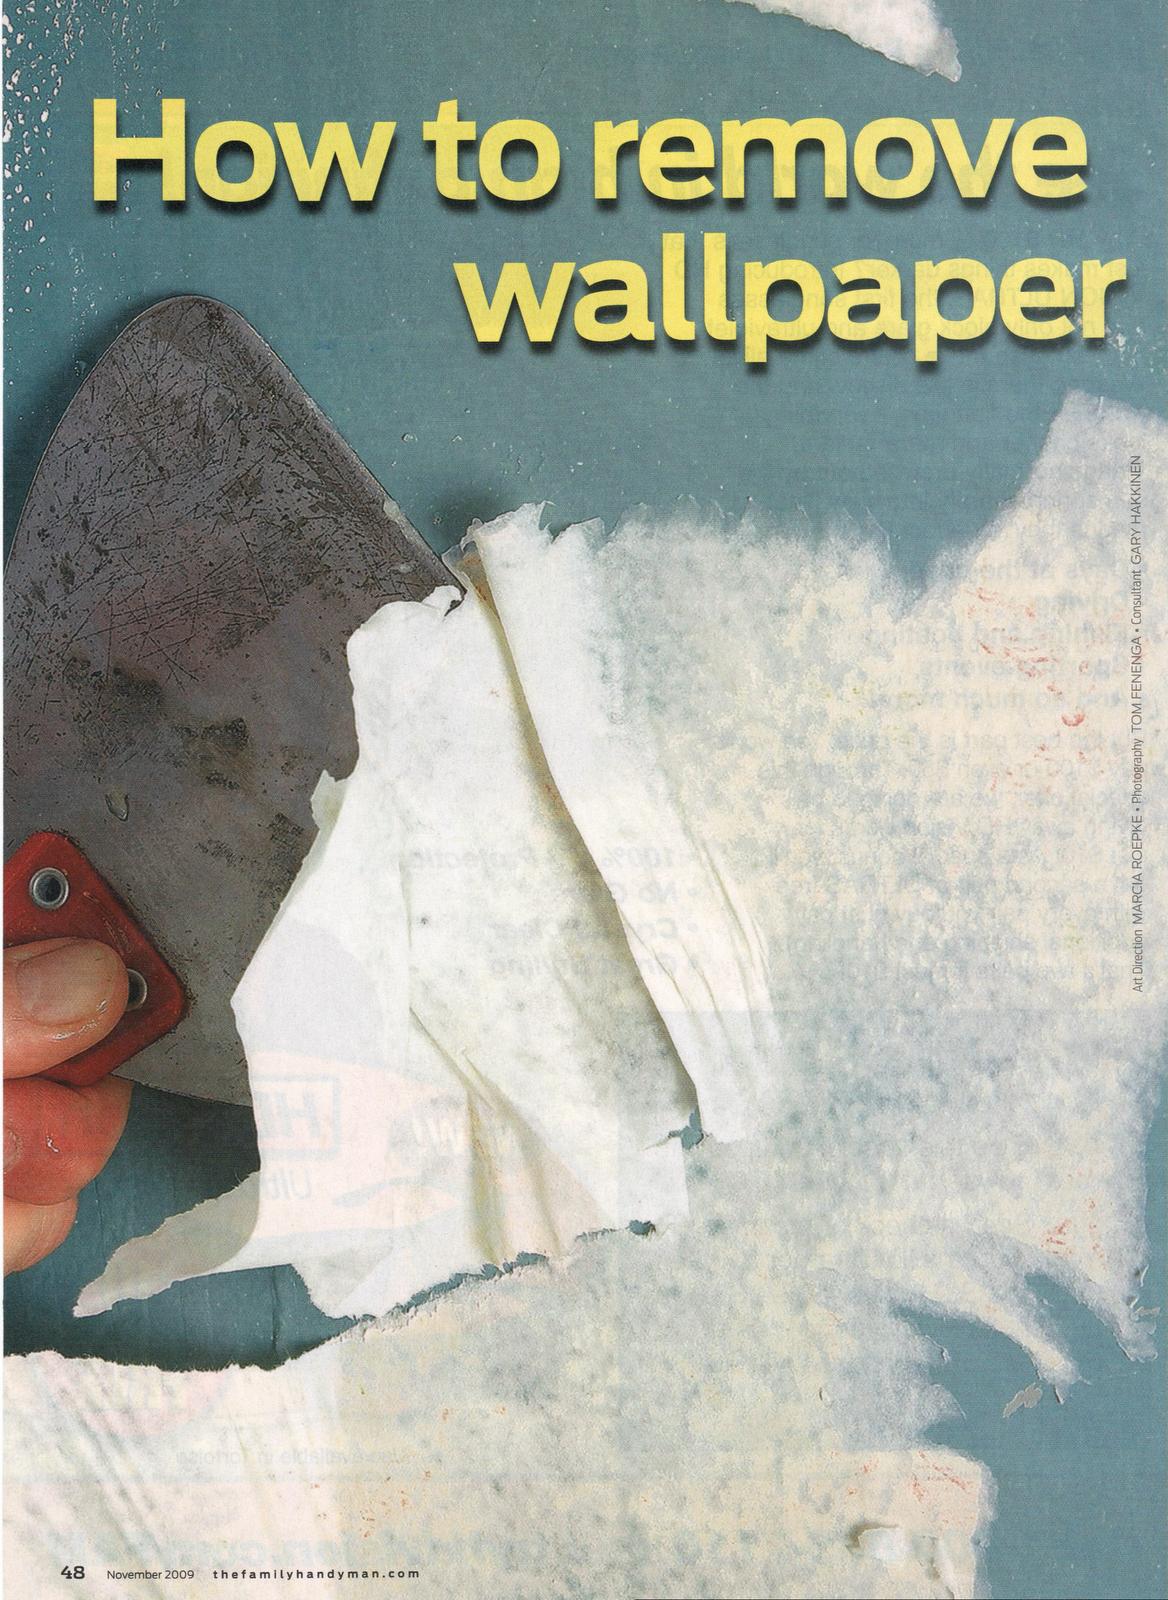 Hd Wallpapers Drywall Y Sto Therm Next 1020 X 420 158 Kb Jpeg HD 1168x1600